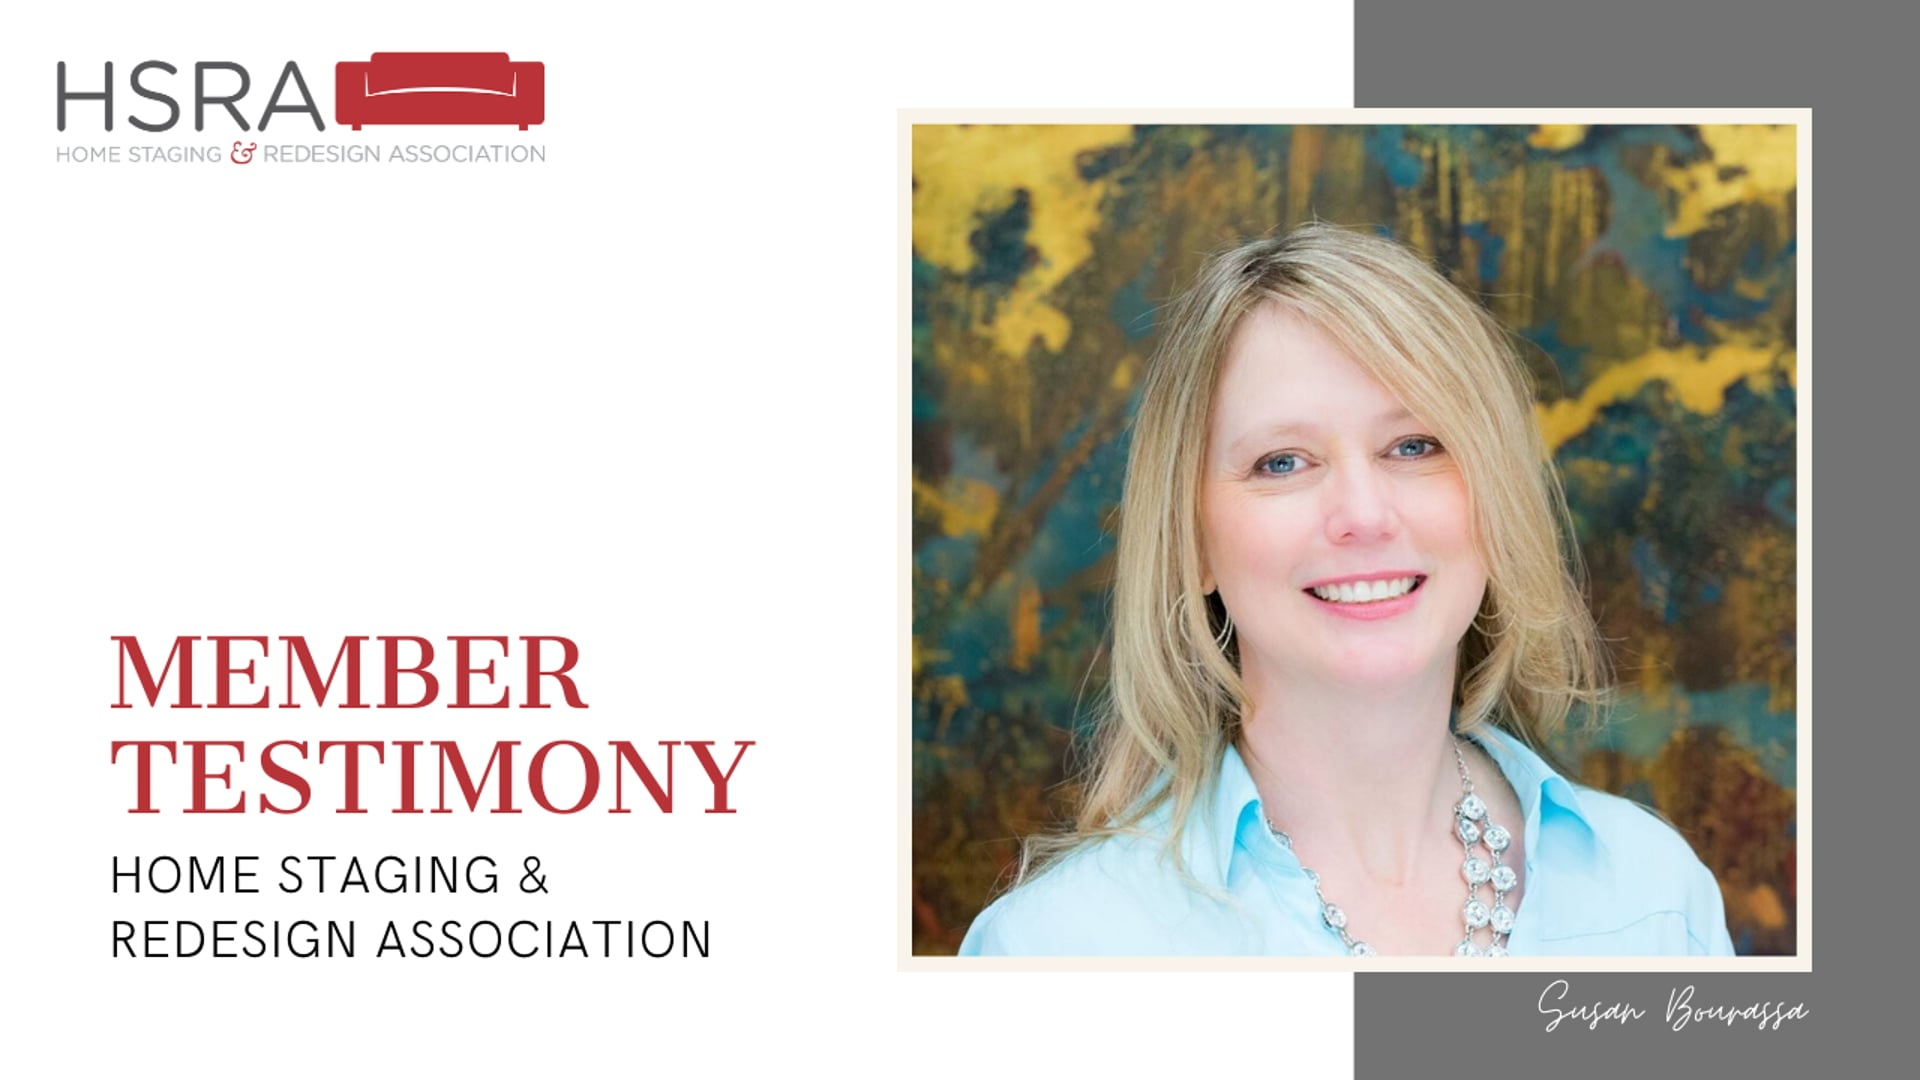 HSRA Member Testimony 2020 Susan Bourassa